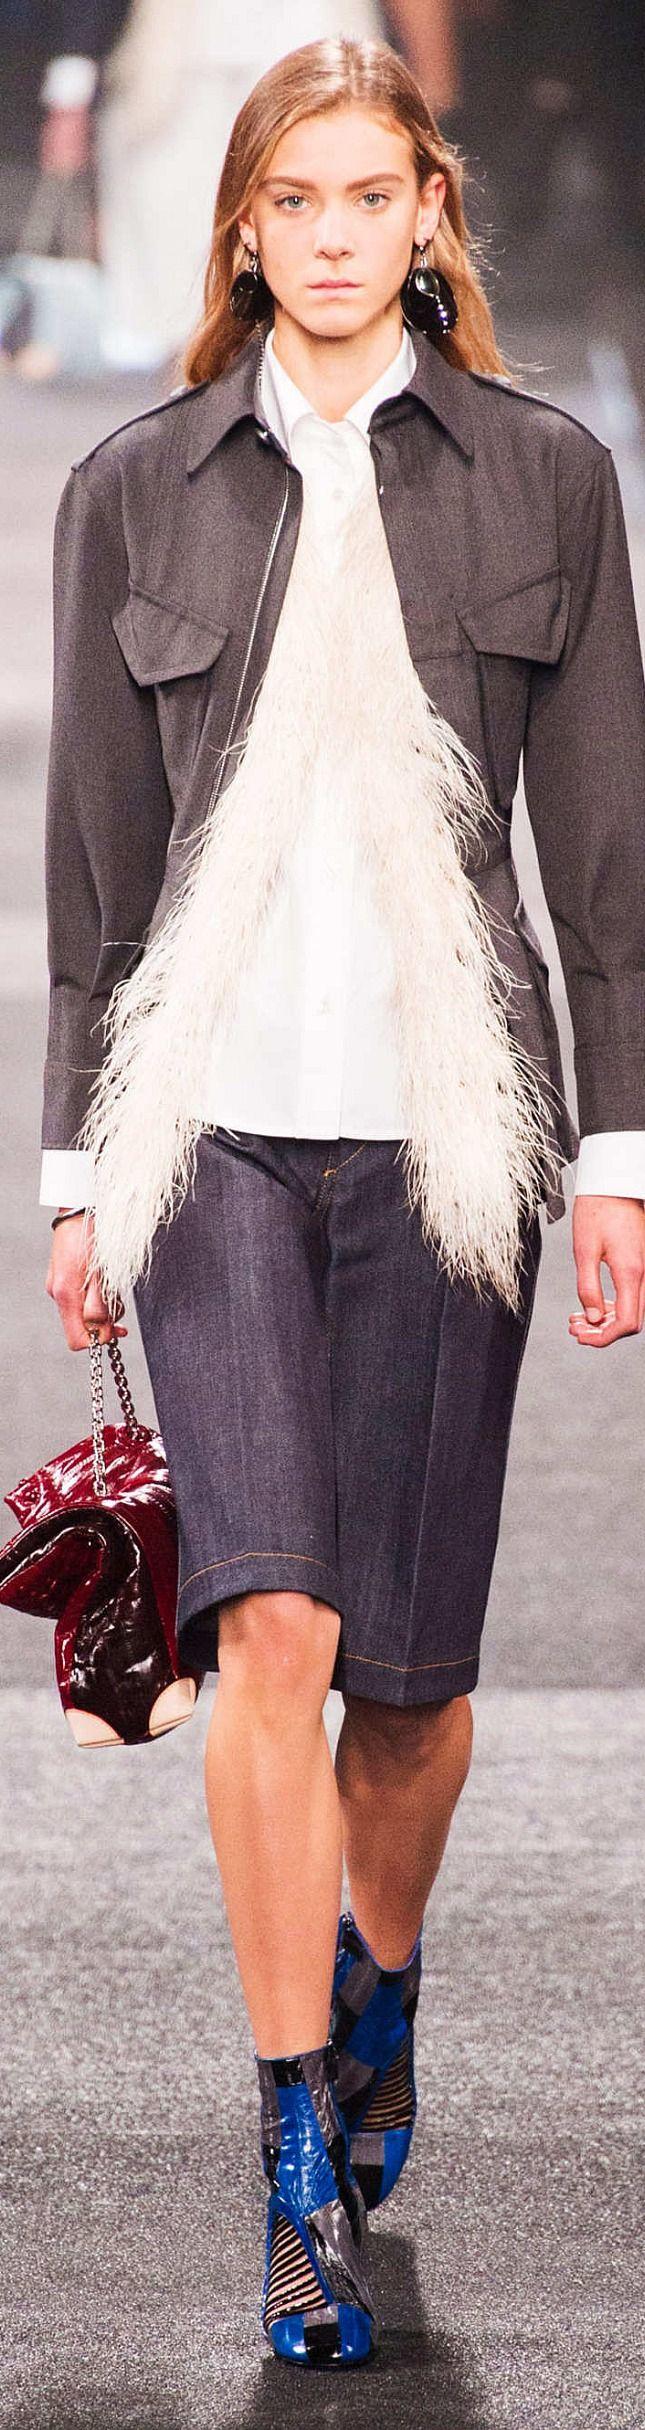 ~Louis Vuitton Spring 2015 | House of Beccaria